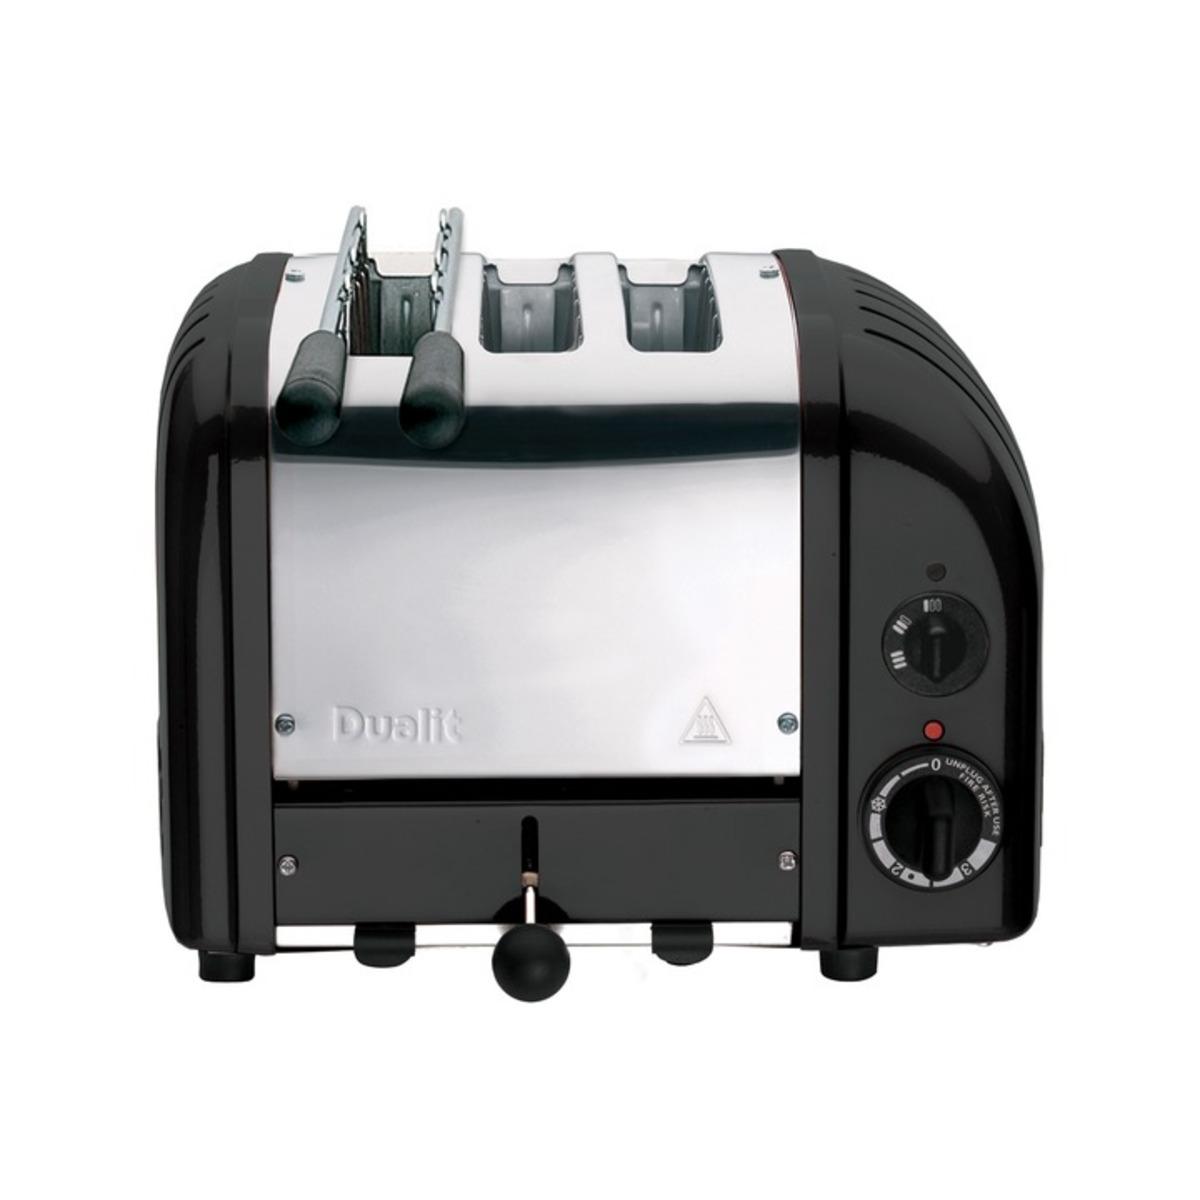 Dualit 31205 Classic Vario AWS Combi 2 + 1 Toaster, Black